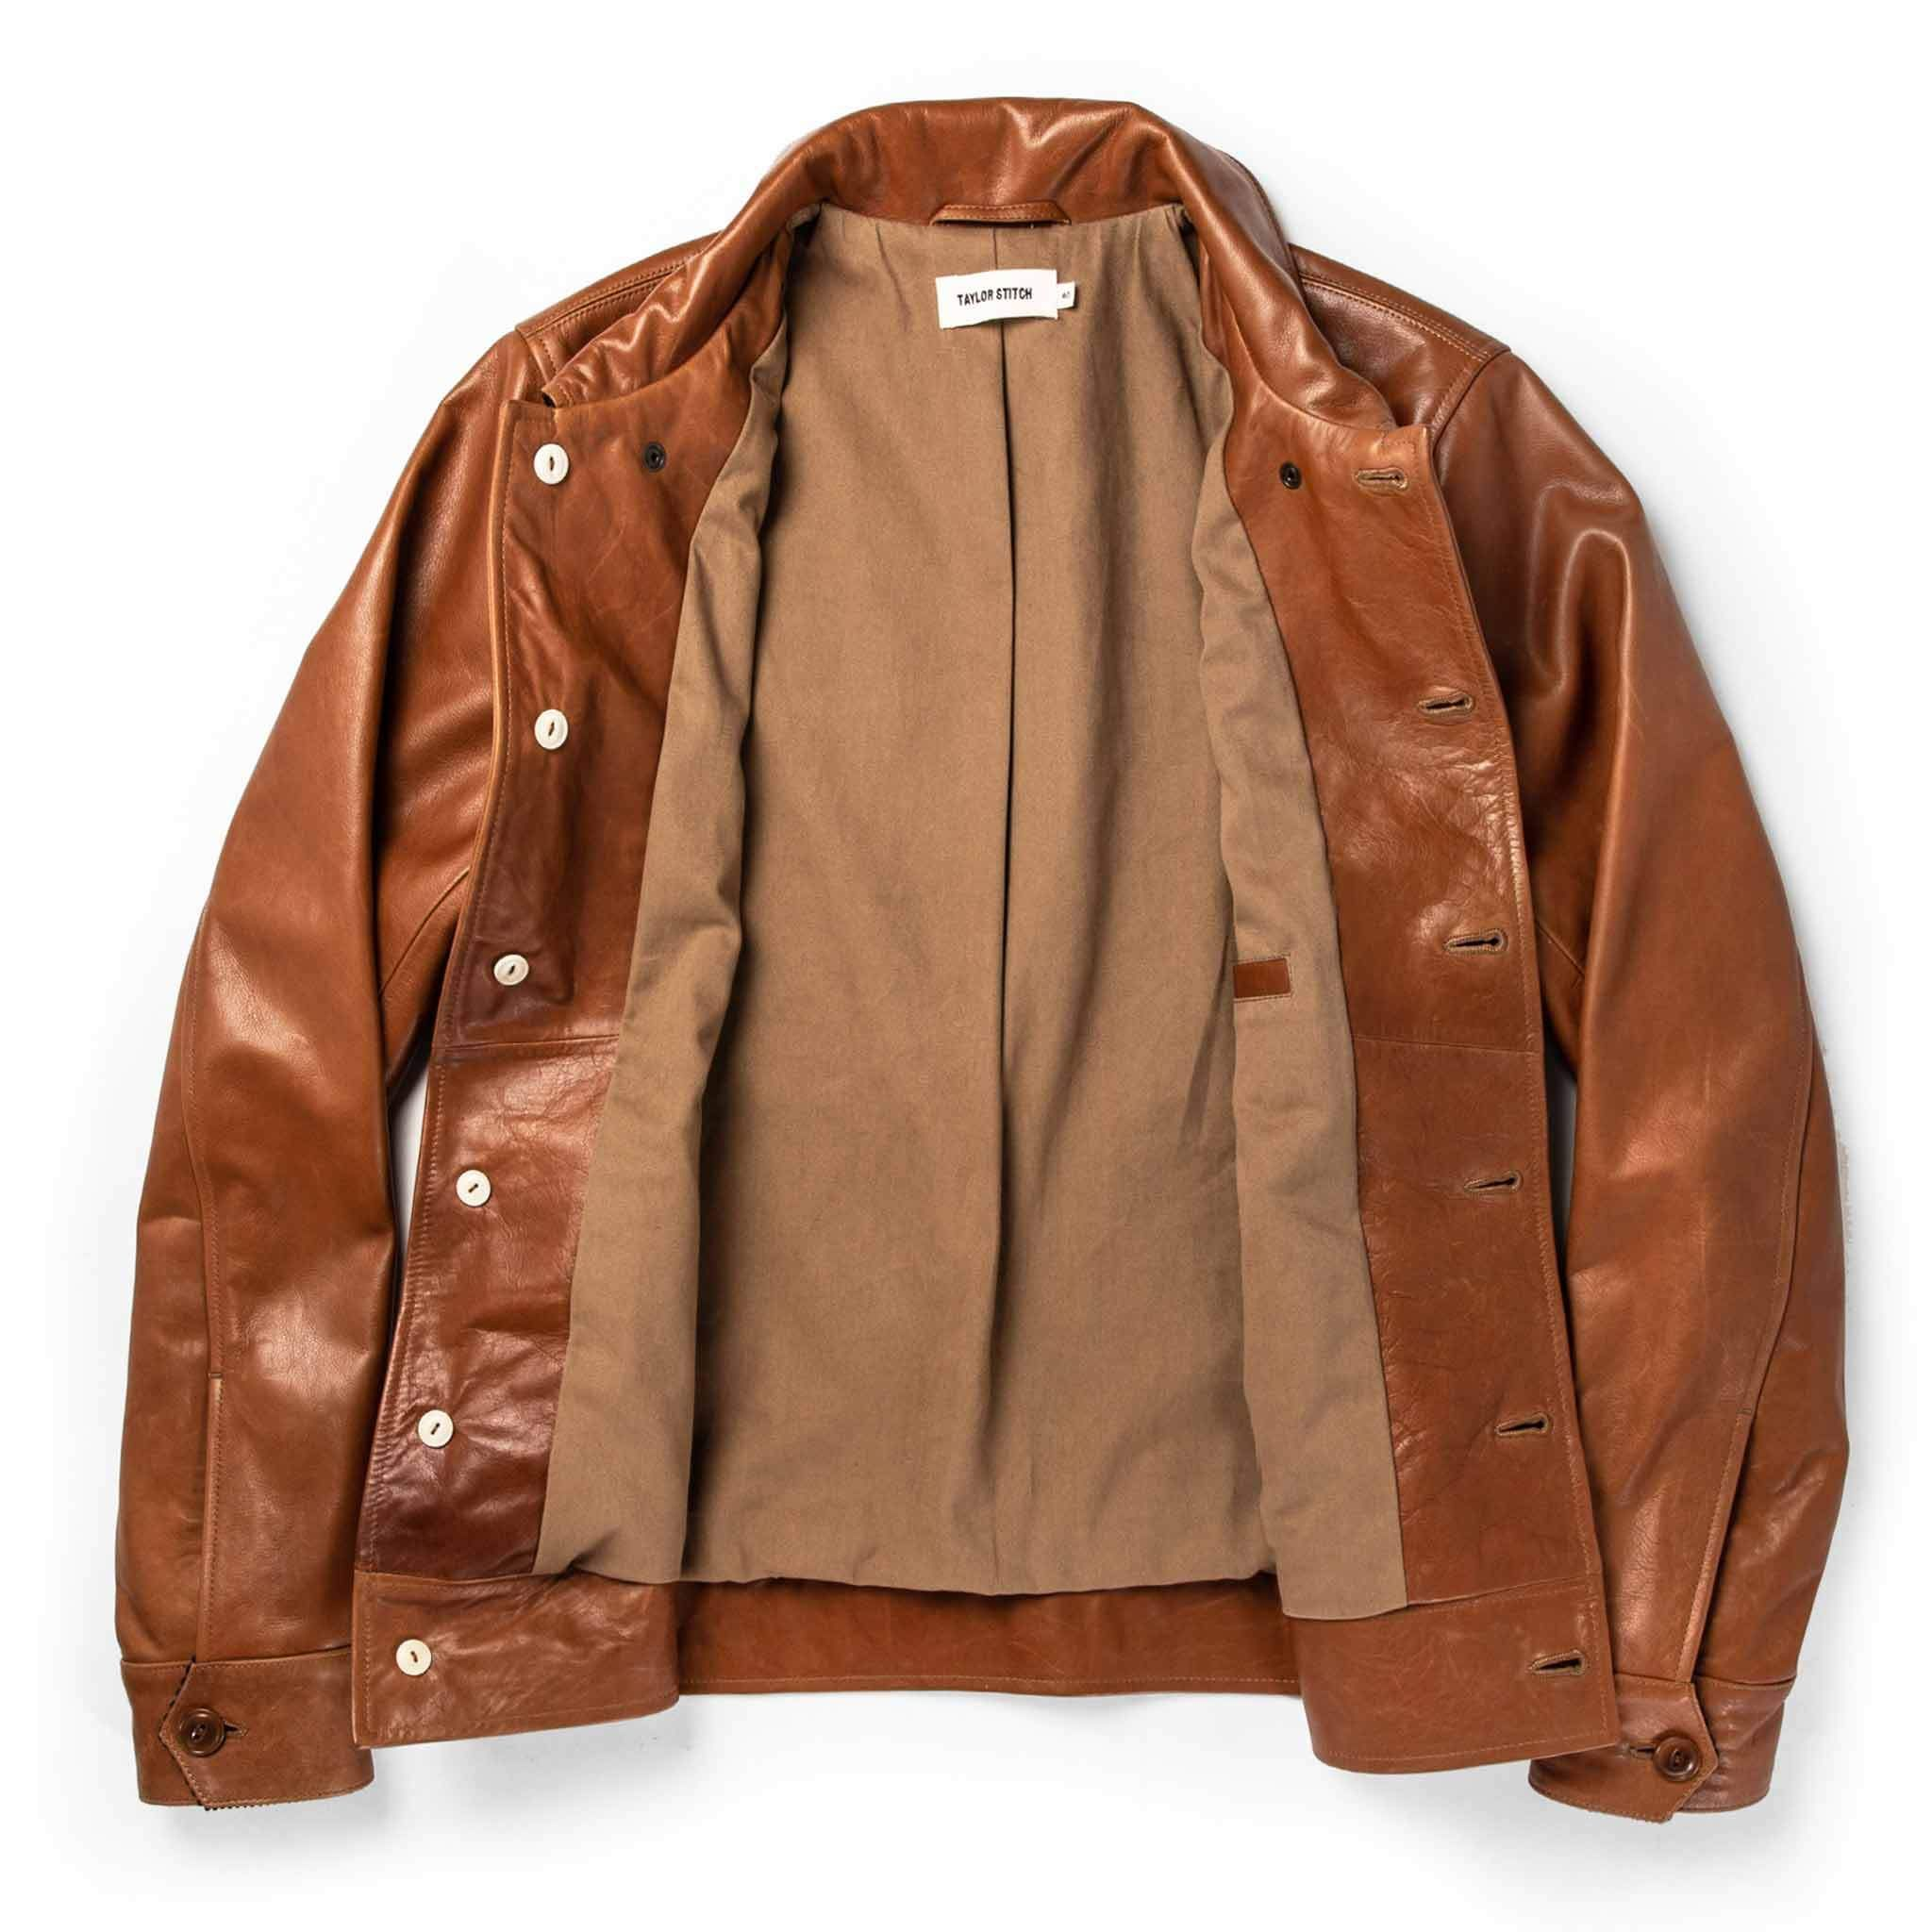 The Cuyama Jacket In Cognac Jackets Taylor Stitch Timeless Fashion [ 2048 x 2048 Pixel ]